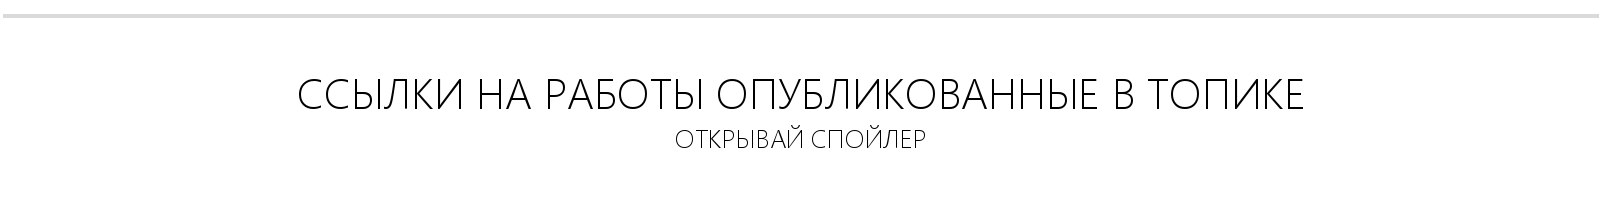 KA7sY4Oc0tY.jpg